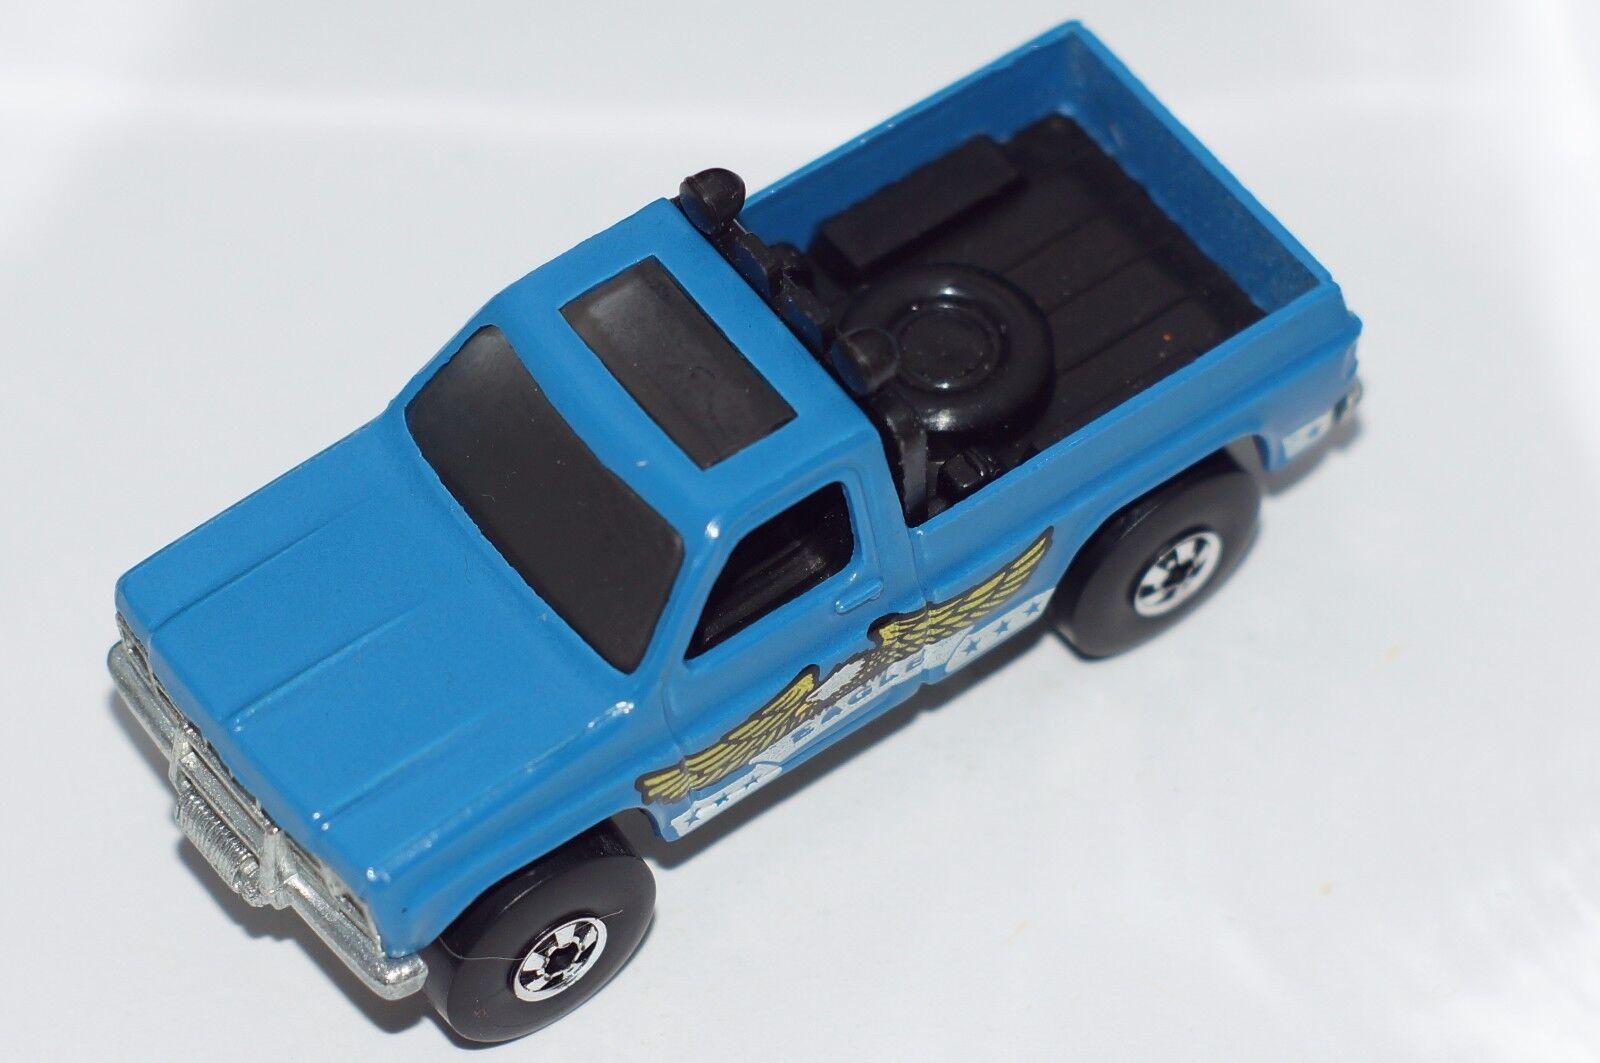 ORIGINAL Hot Wheels Trailbusters - Blau Bywayman Eagle Pickup - BWs - Metal Base